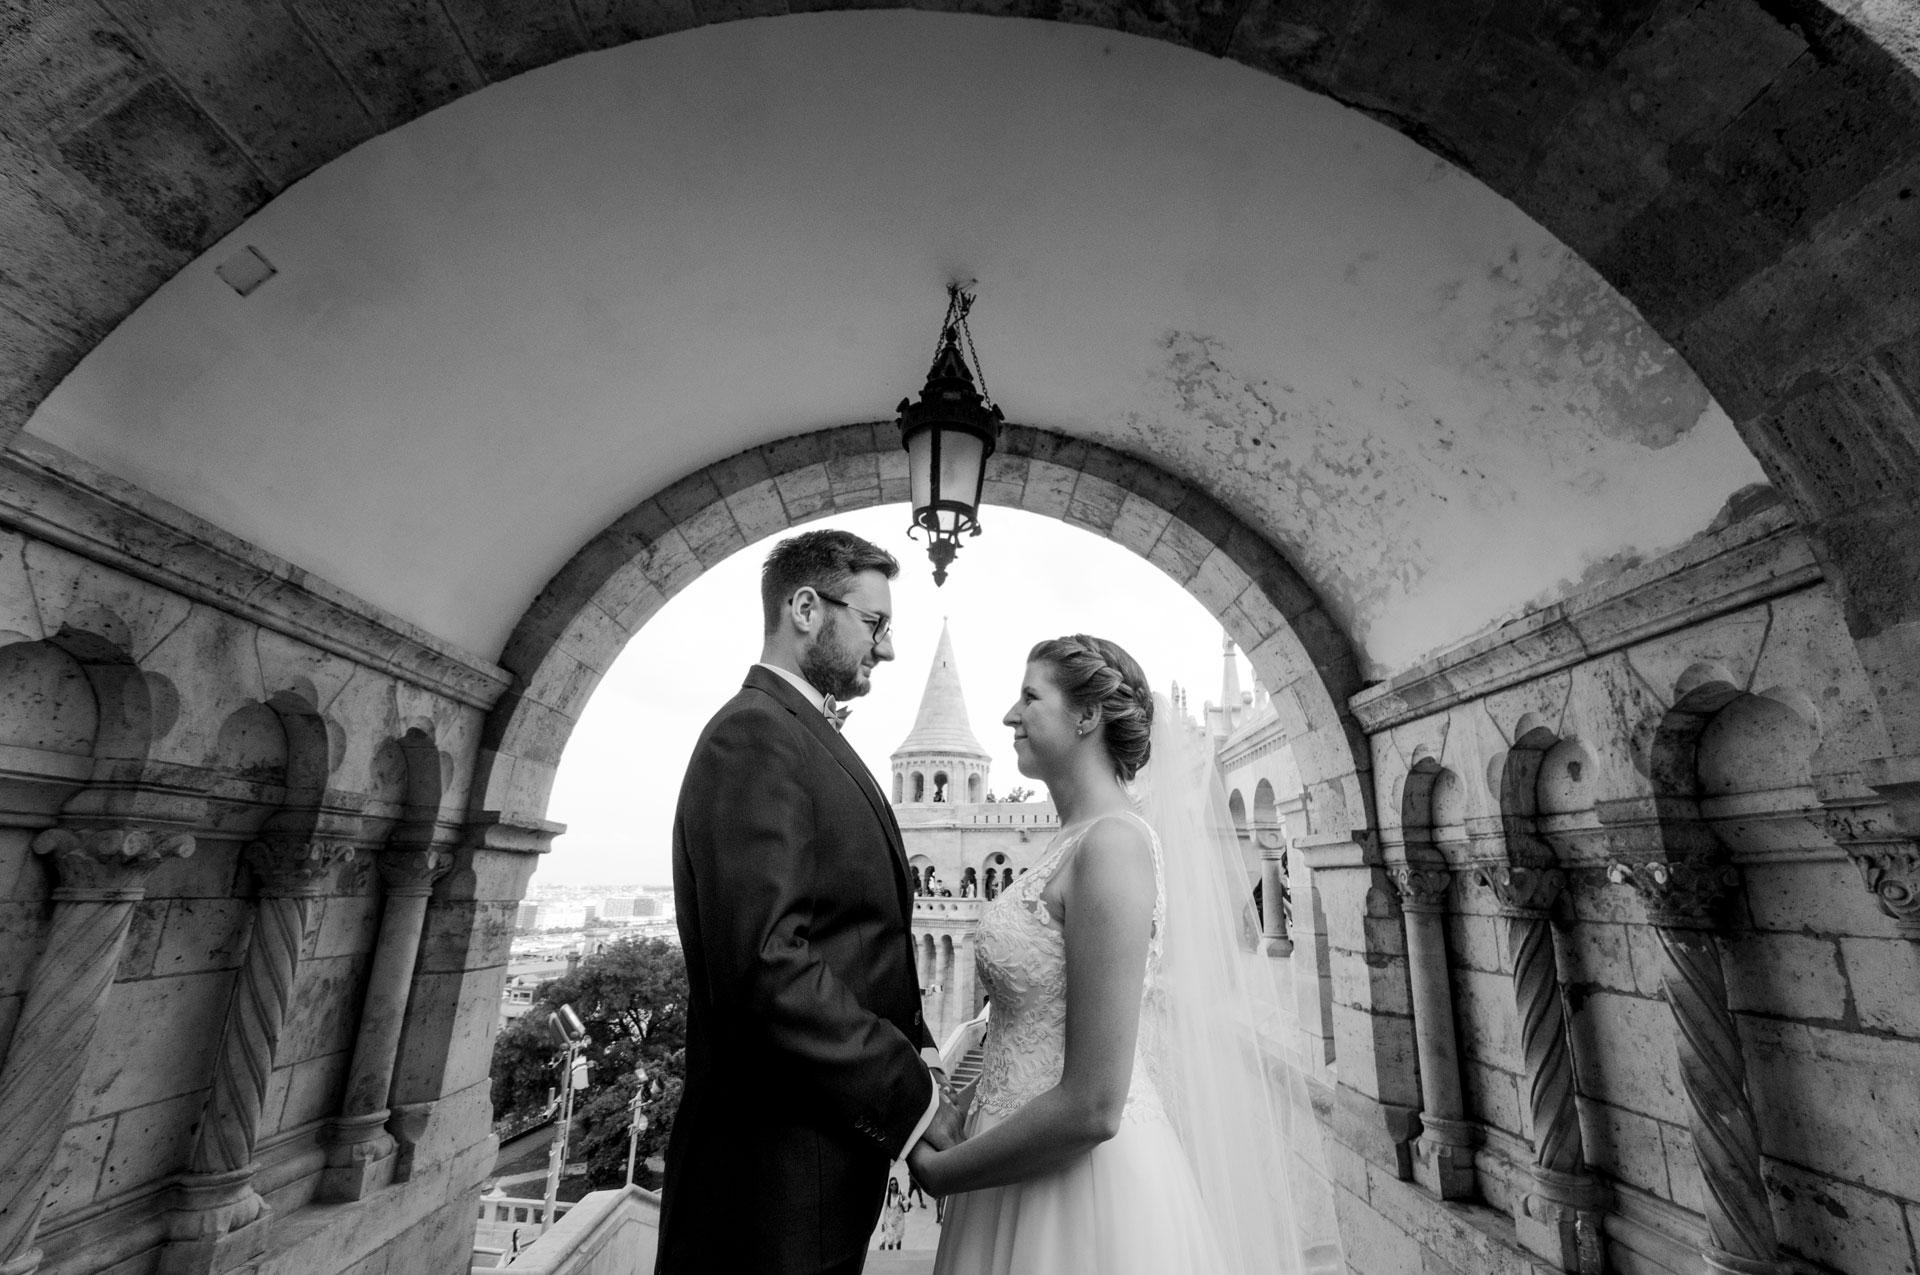 Budapest adventure wedding and honeymoon choice